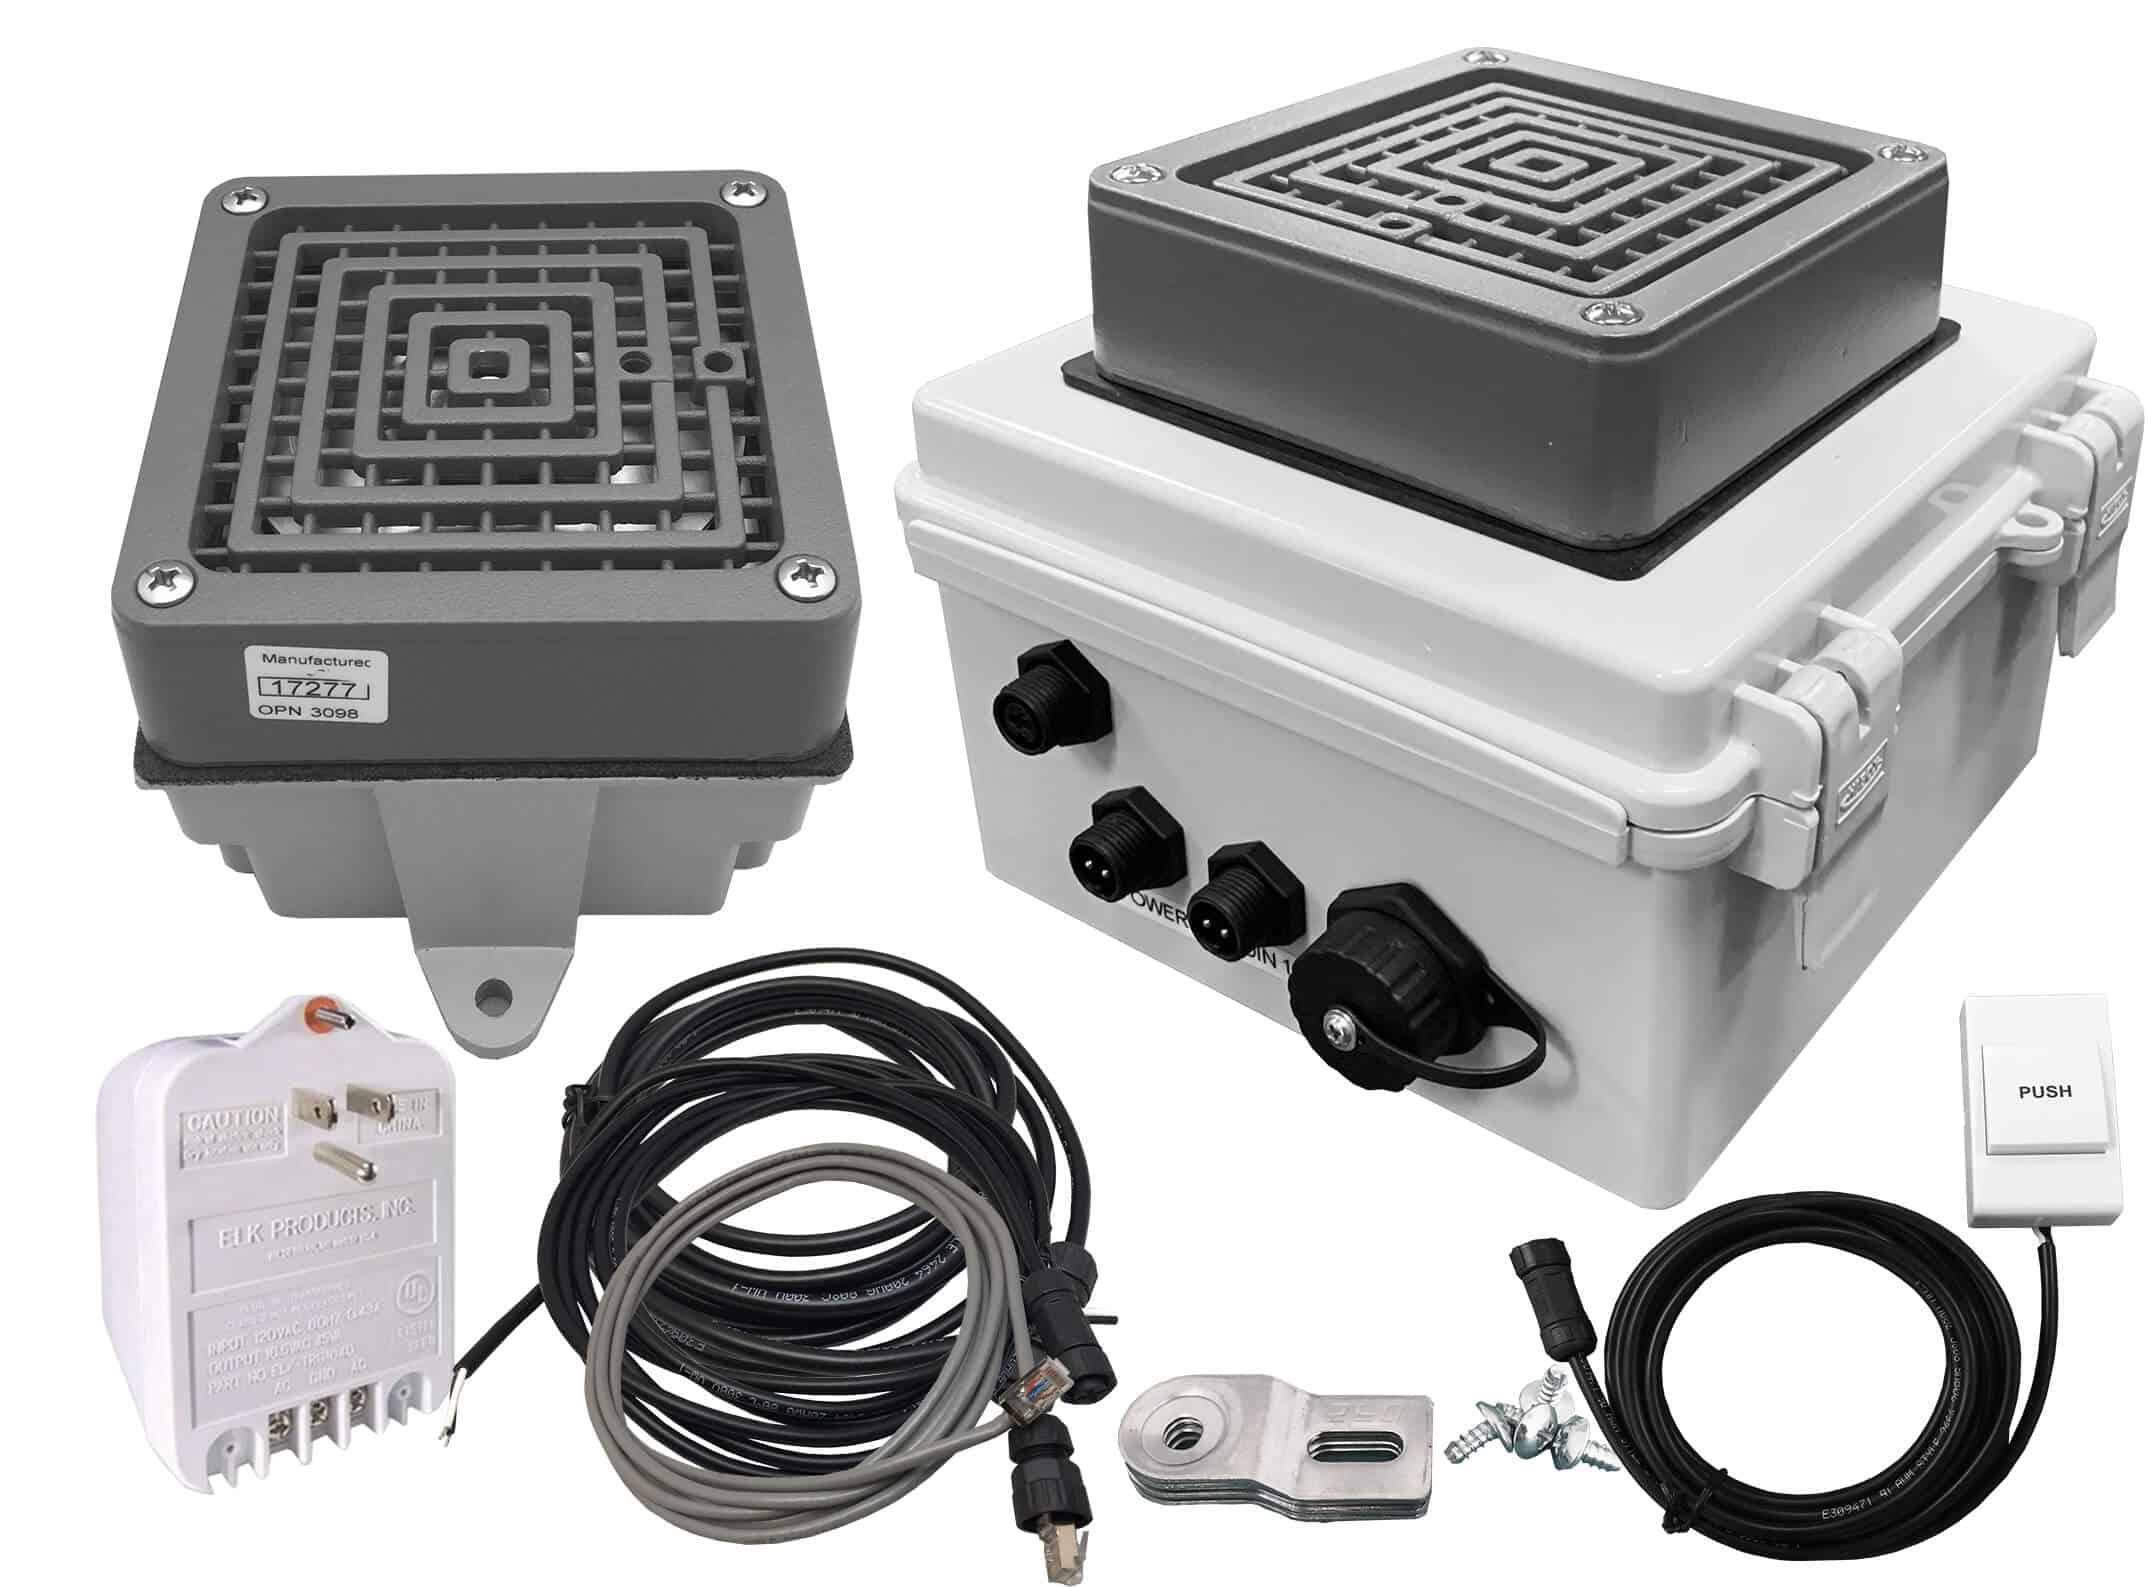 Linortek Netbell-KB-E1 TCP/IP Extra Loud Factory Warehouse Break Buzzer System Programmable Bell Timer Controller w/1 Ext. Buzzer (2 Buzzers System)